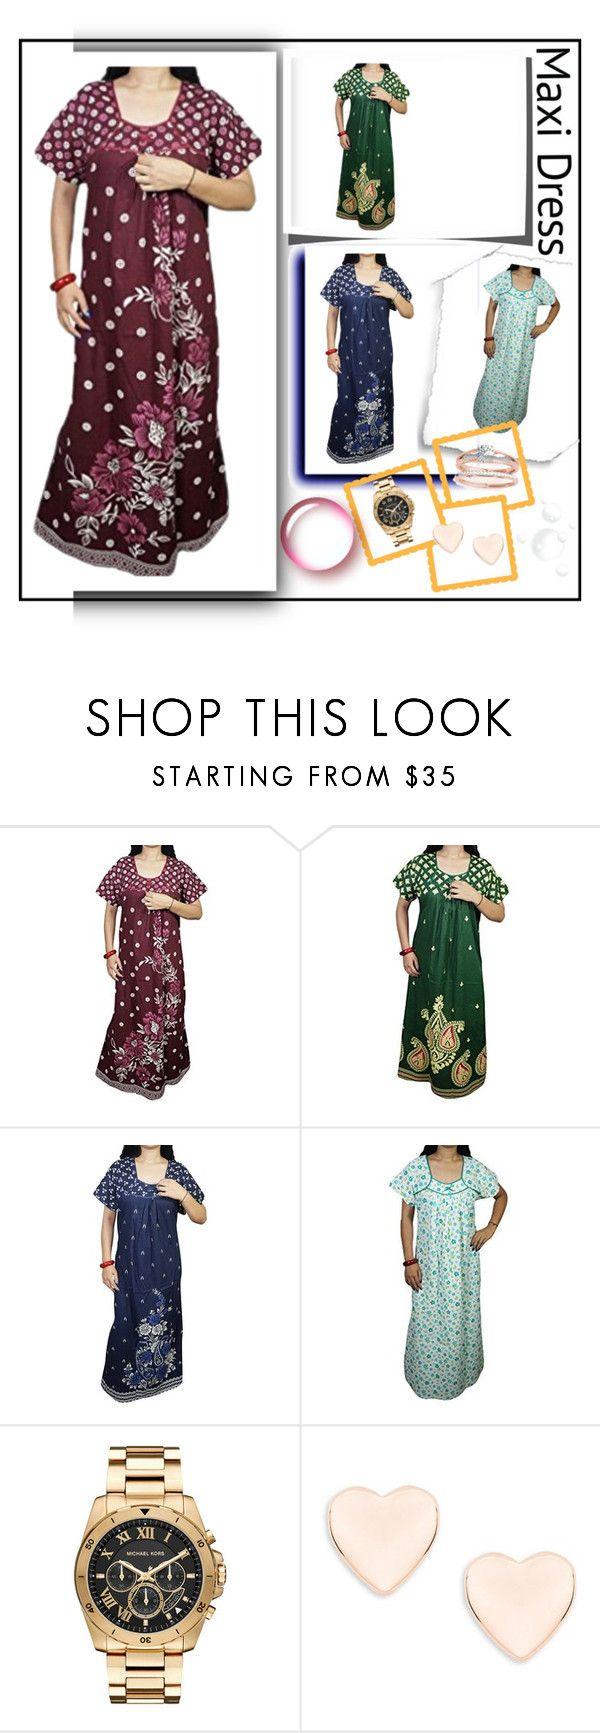 WOMEN'S COTTON NIGHTWEAR MAXI DRESS by lavanyas-trendzs on Polyvore featuring Michael Kors and Ted Baker  #nighty #maxi #nightgown #fancy #sleepwear #nightwear #summercollection #womennighty #sale #online #cotton